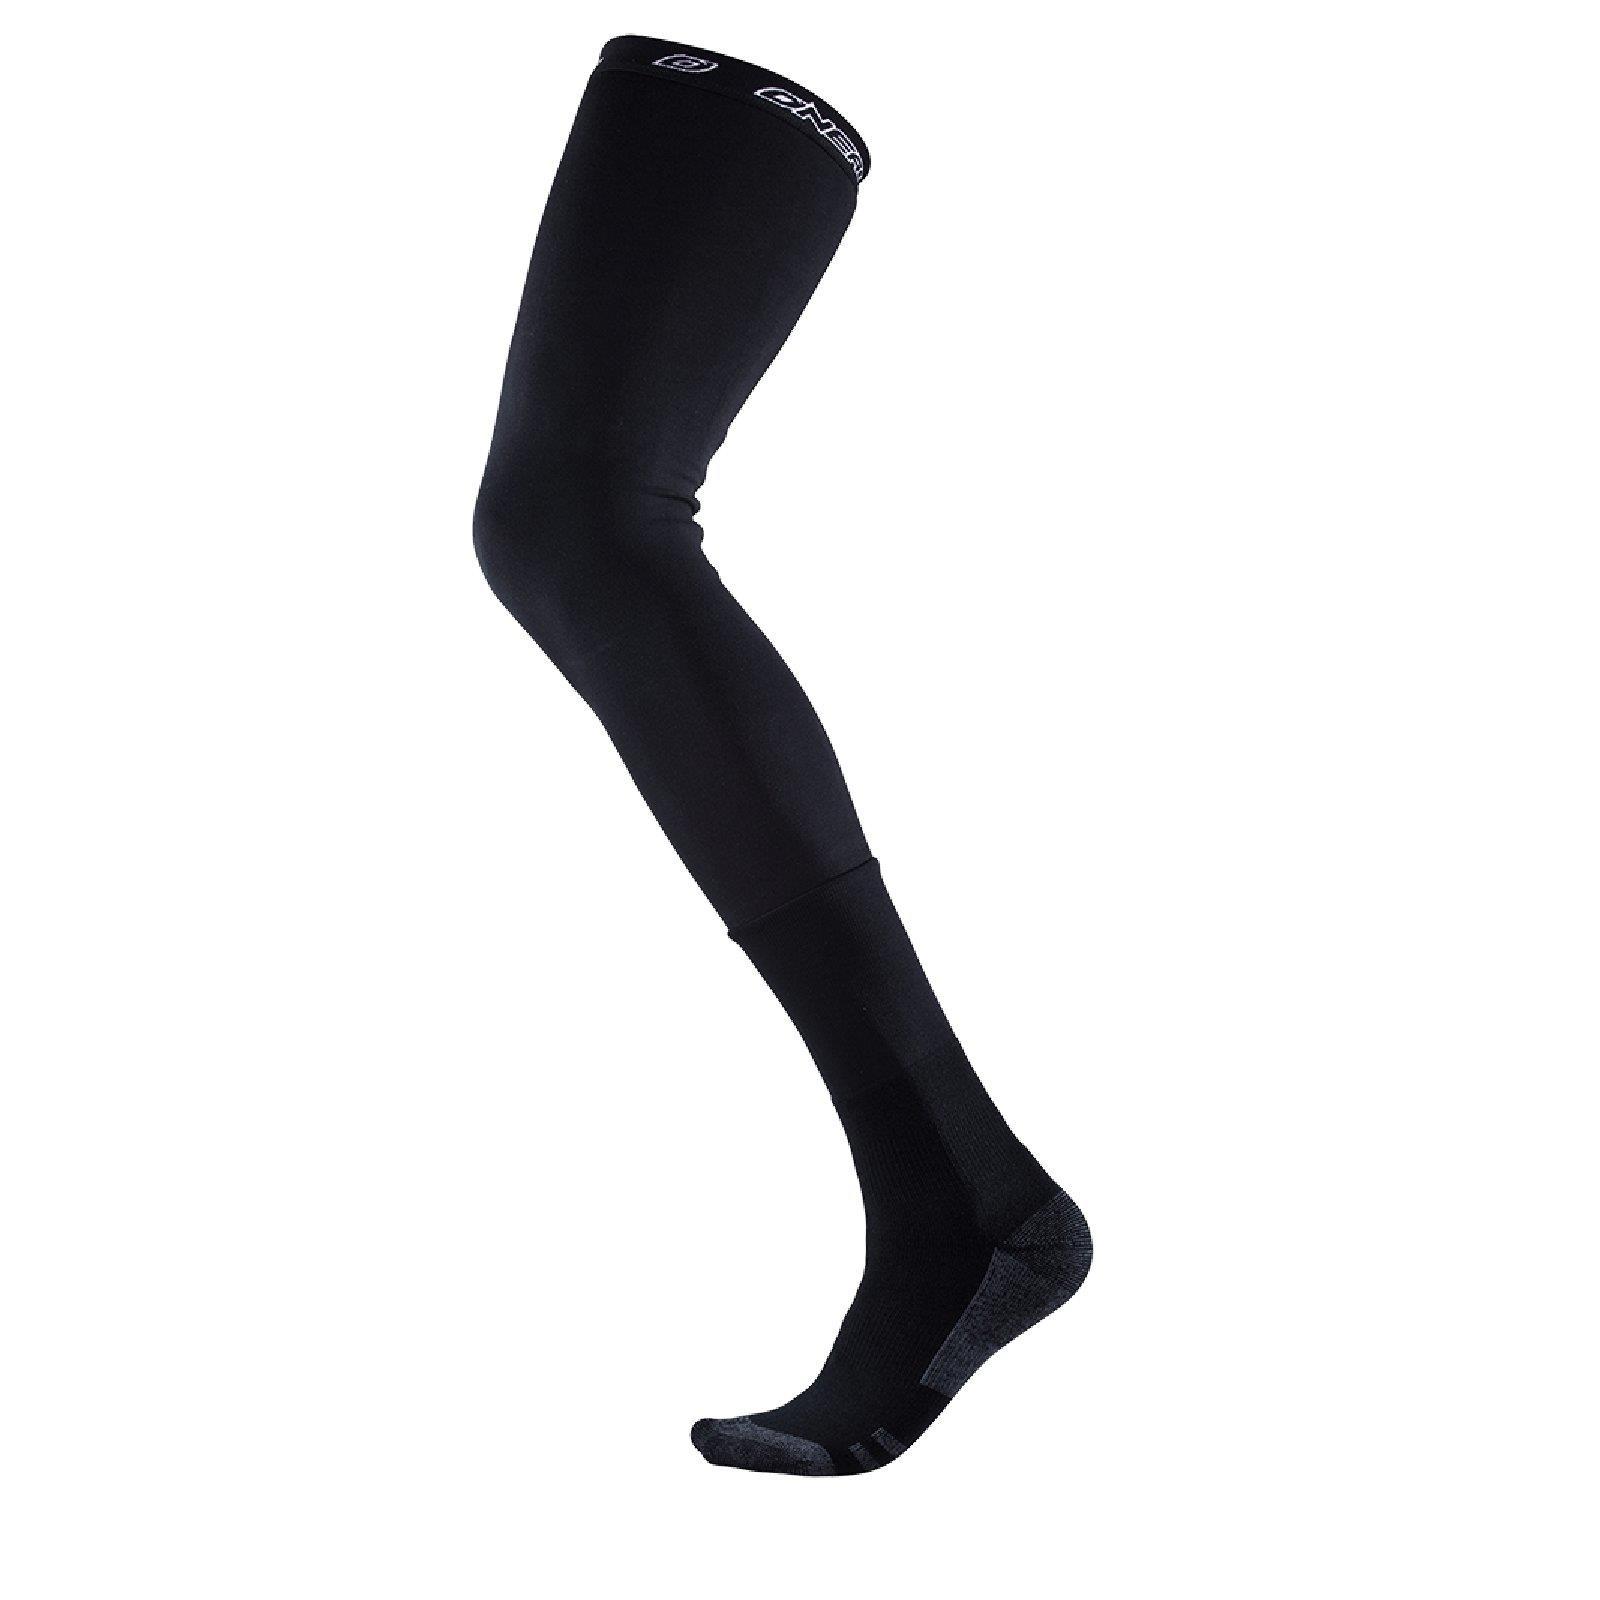 ONEAL-MOTO-CROSS-Calze-Moto-Enduro-MX-MTB-ATV-Quad-Calze-Sock-BICICLETTA-FR miniatura 56